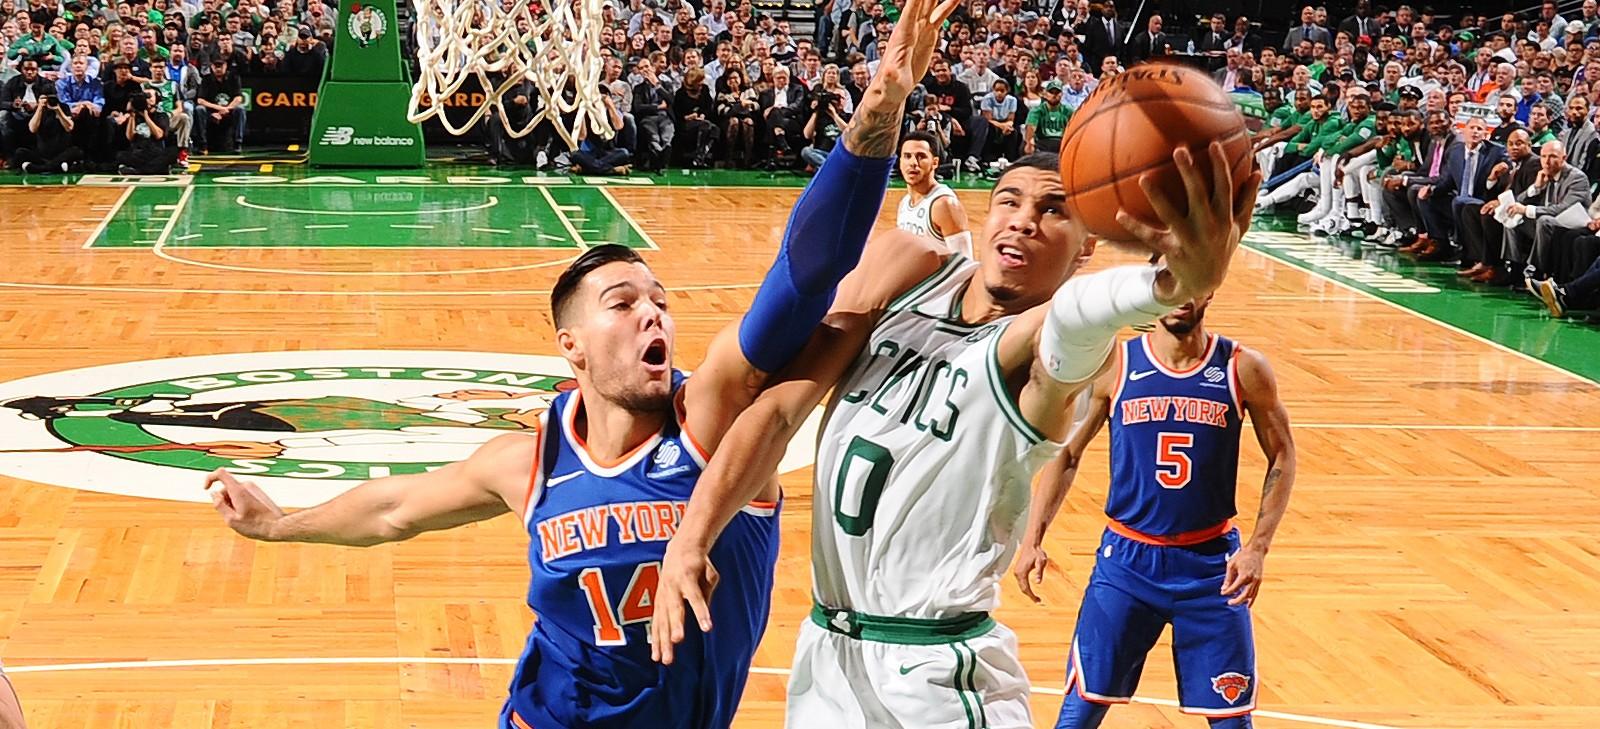 прогноз на матч НБА Нью-Йорк Никс - Бостон Селтикс